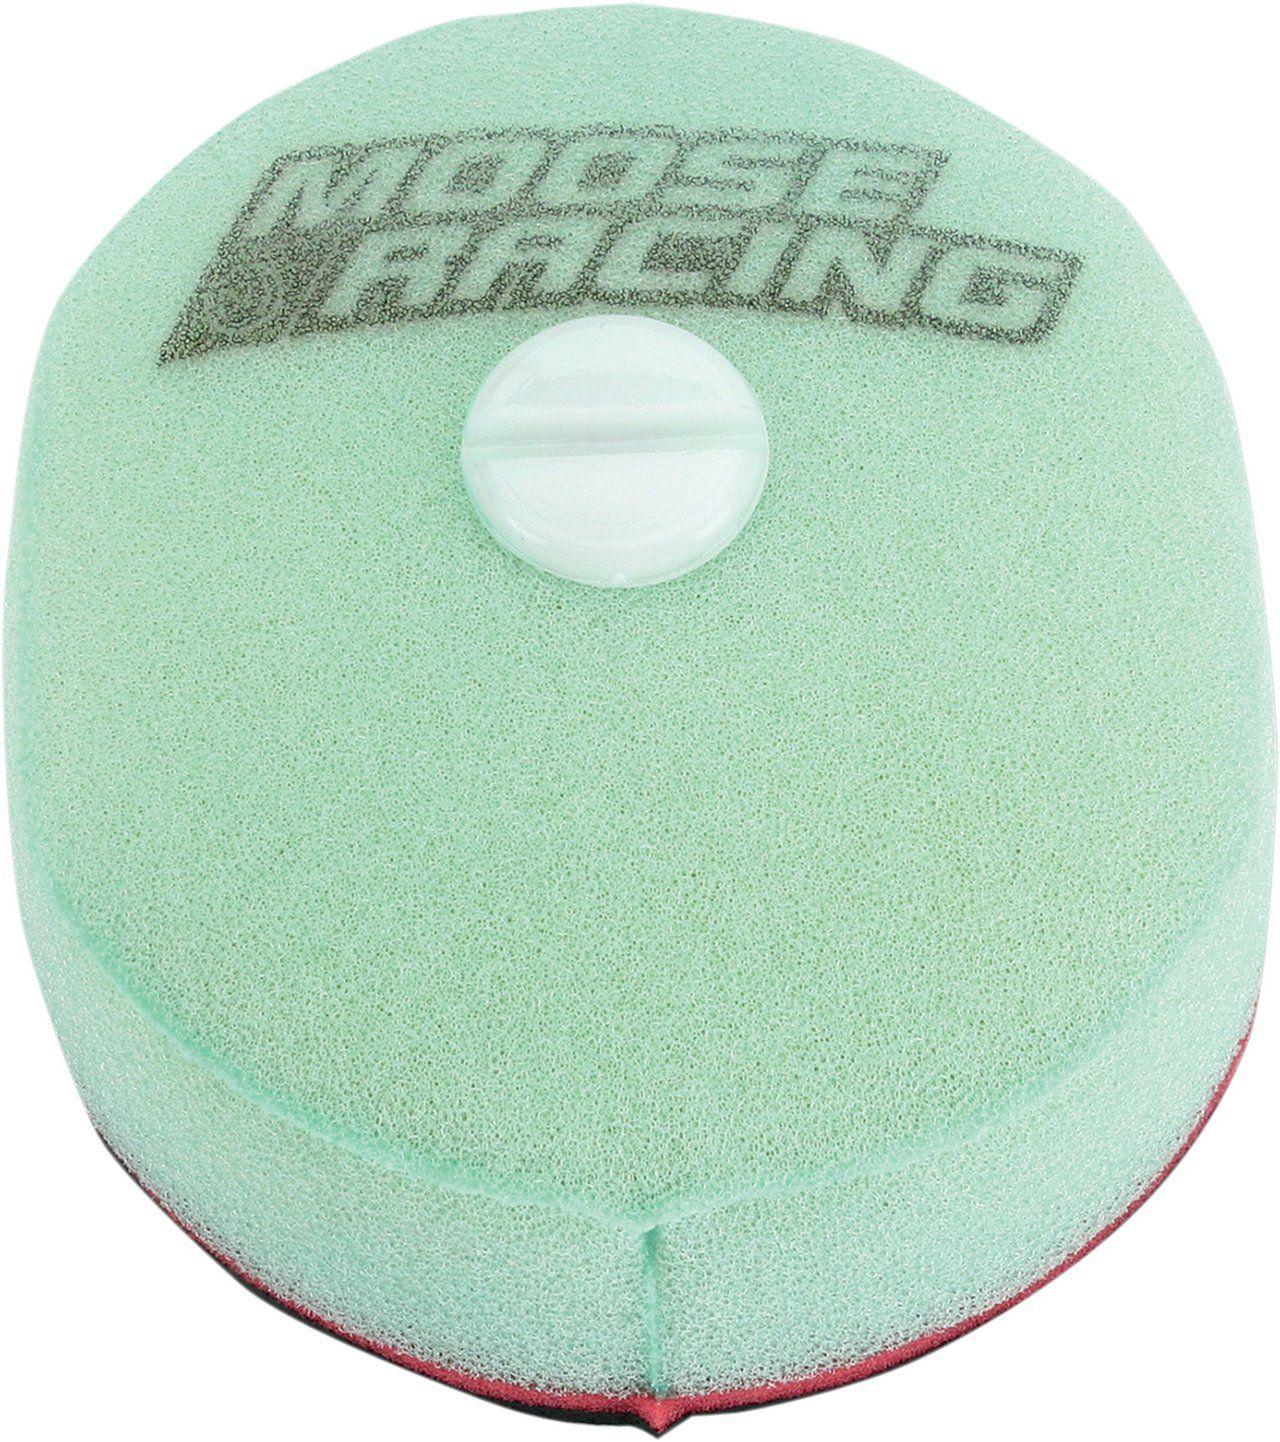 【MOOSE RACING】PRECISION PRE-OILED 空氣濾芯 [1011-0840] - 「Webike-摩托百貨」